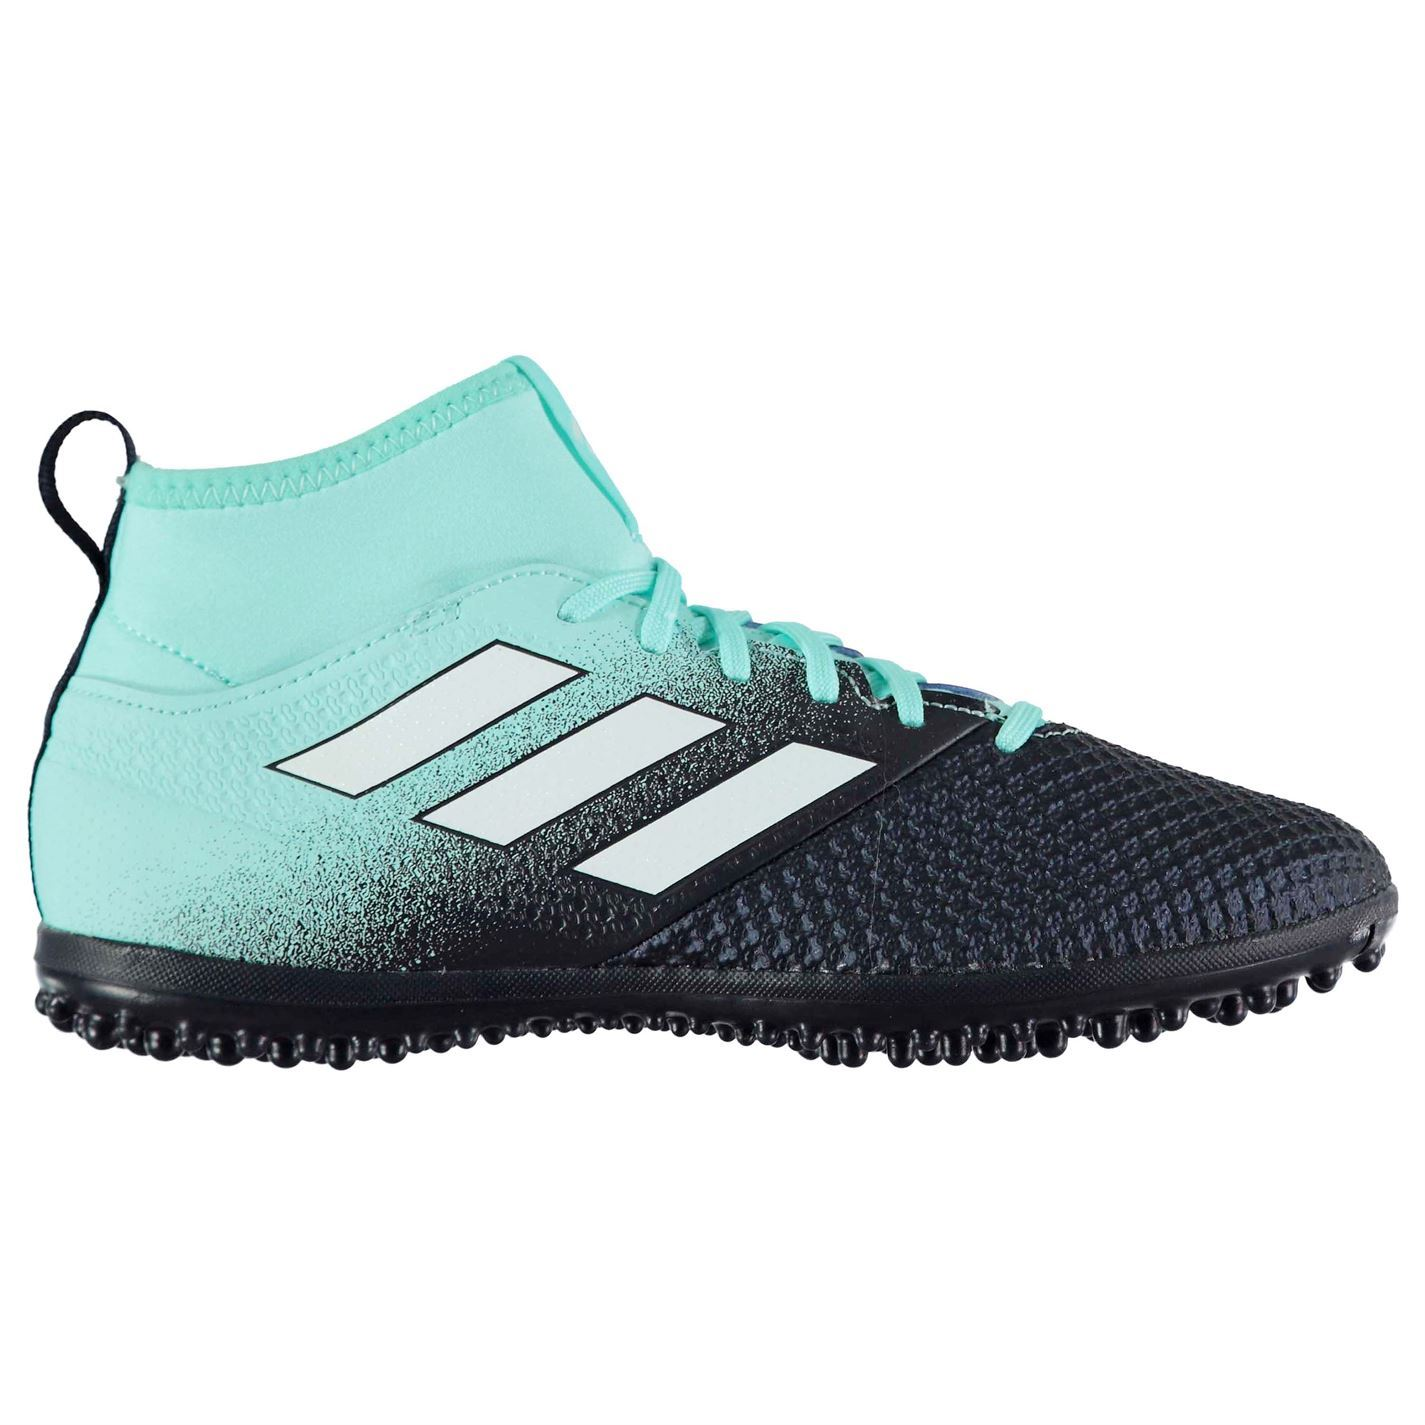 the latest 81d08 c3ab6 adidas-Mens-Ace-17-3-Primemesh-Astro-Turf-